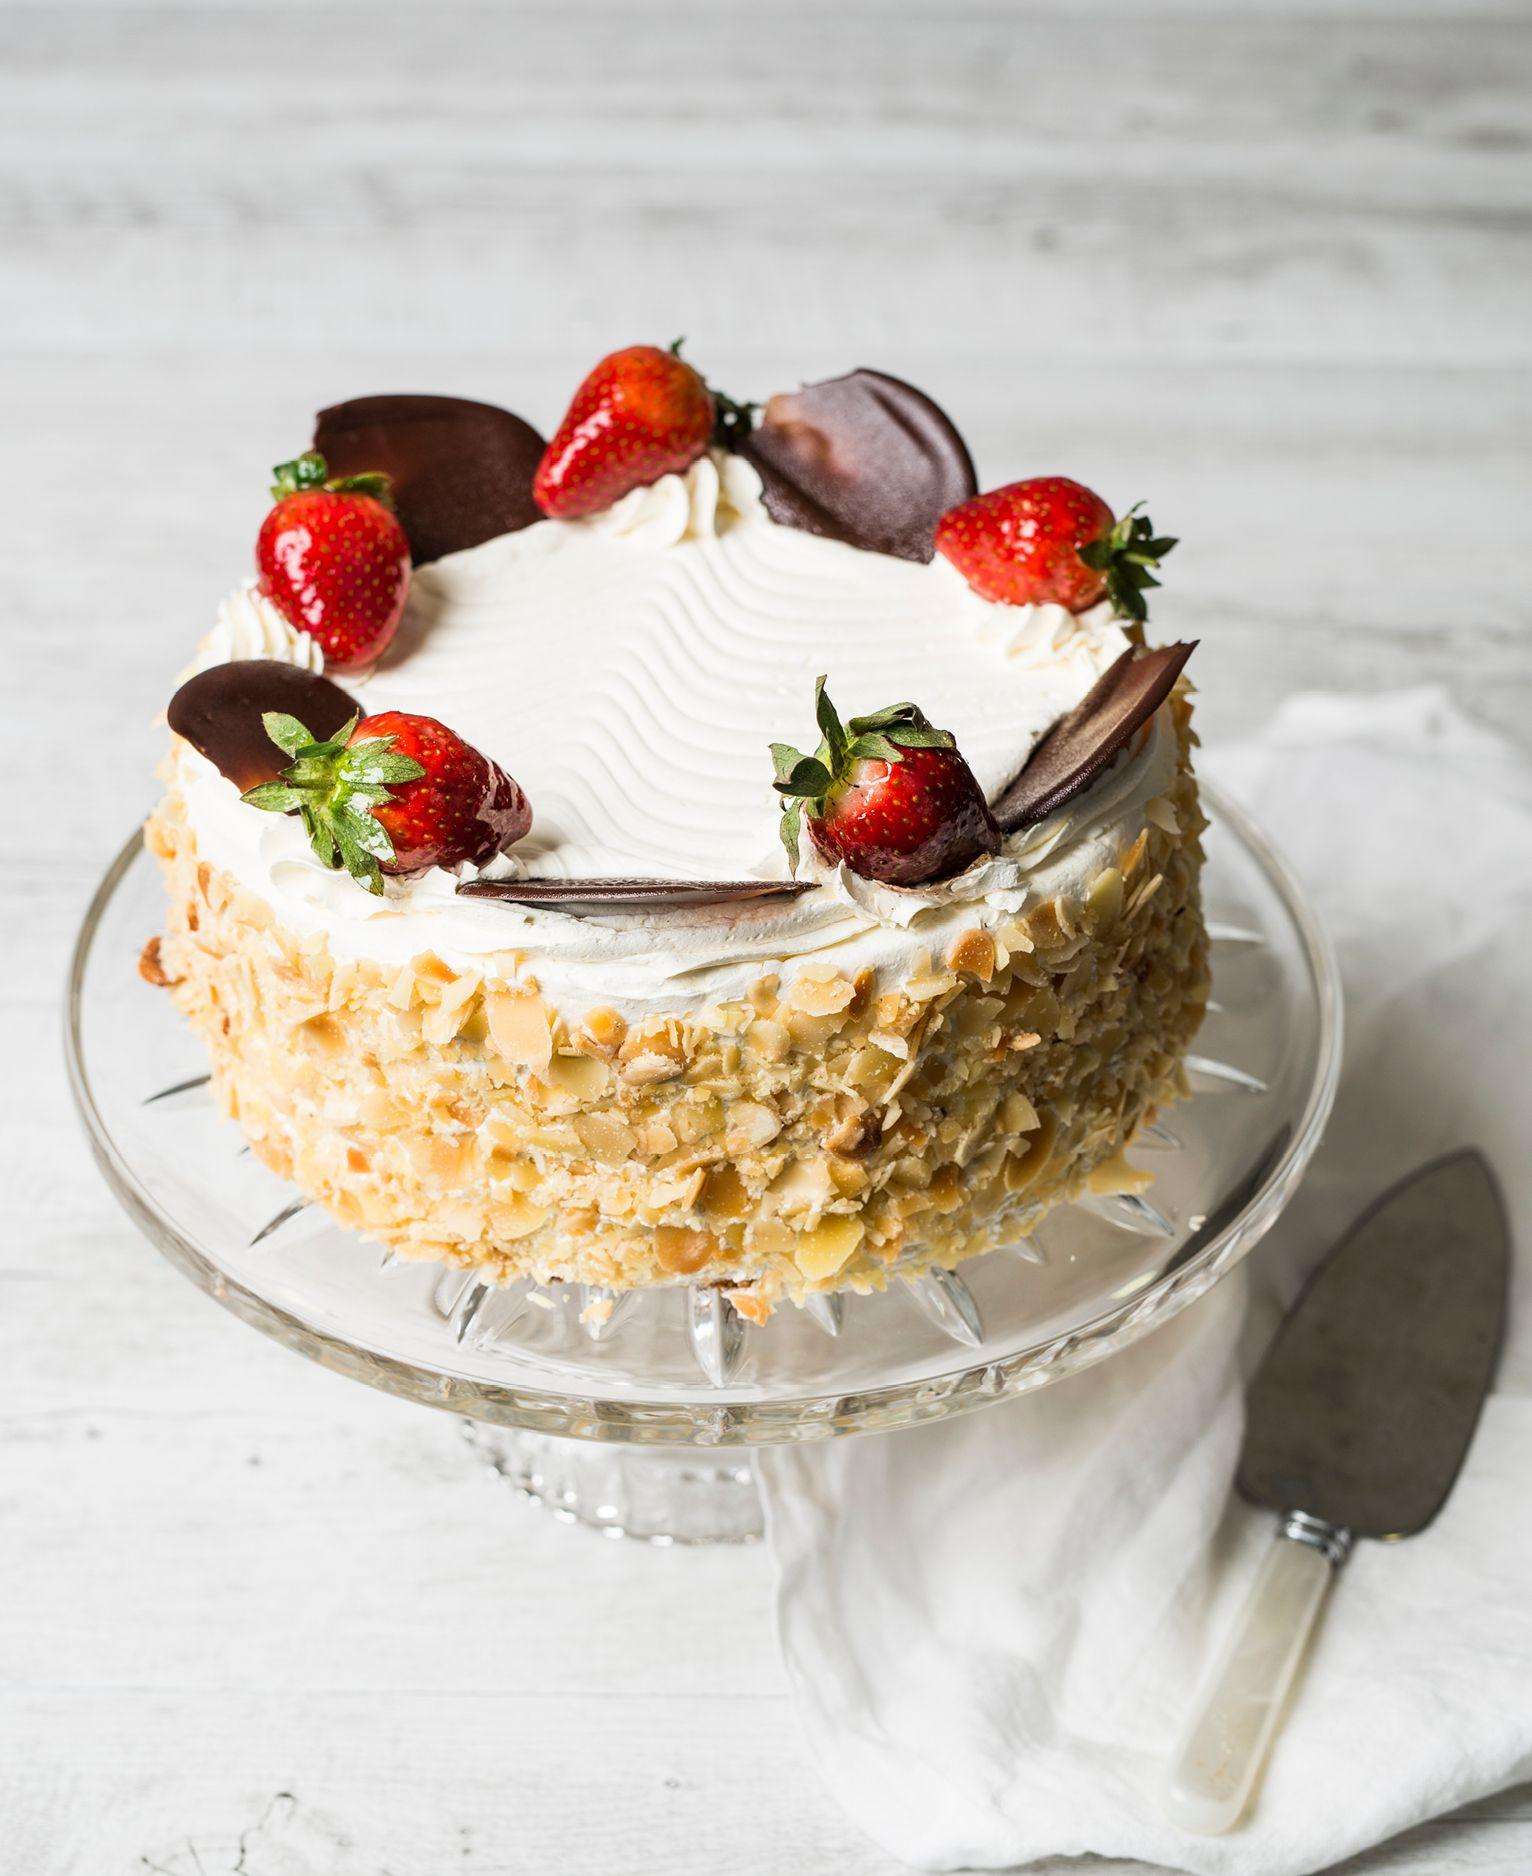 Strawberries & Cream Cake in 2020 Strawberry cream cakes